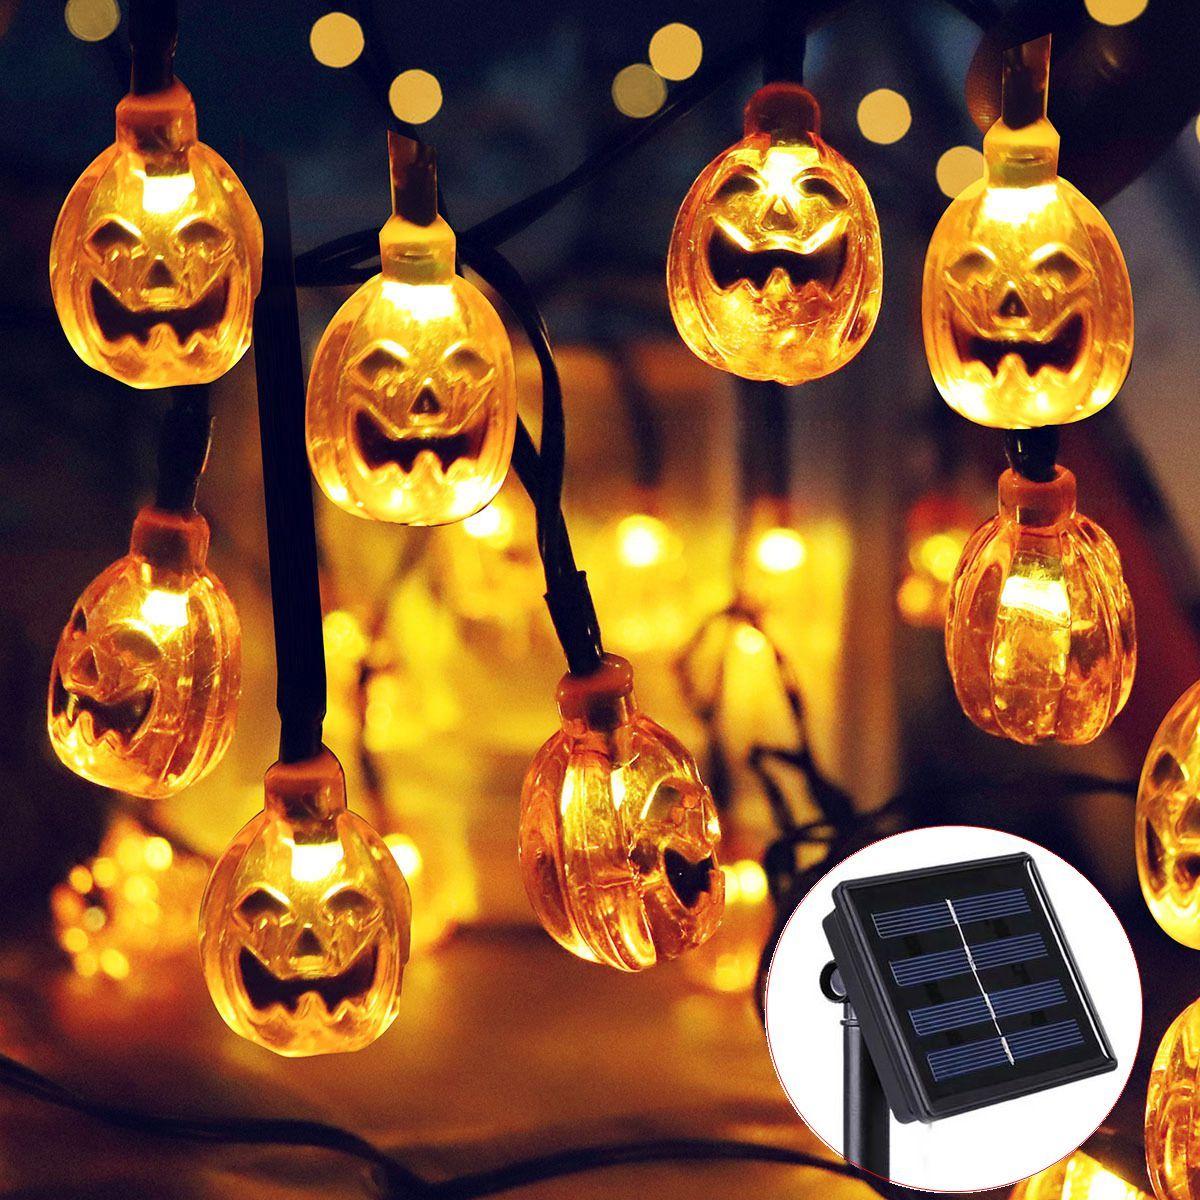 solar halloween 30 led warm white pumpkin string lights garden decor rh dhgate com